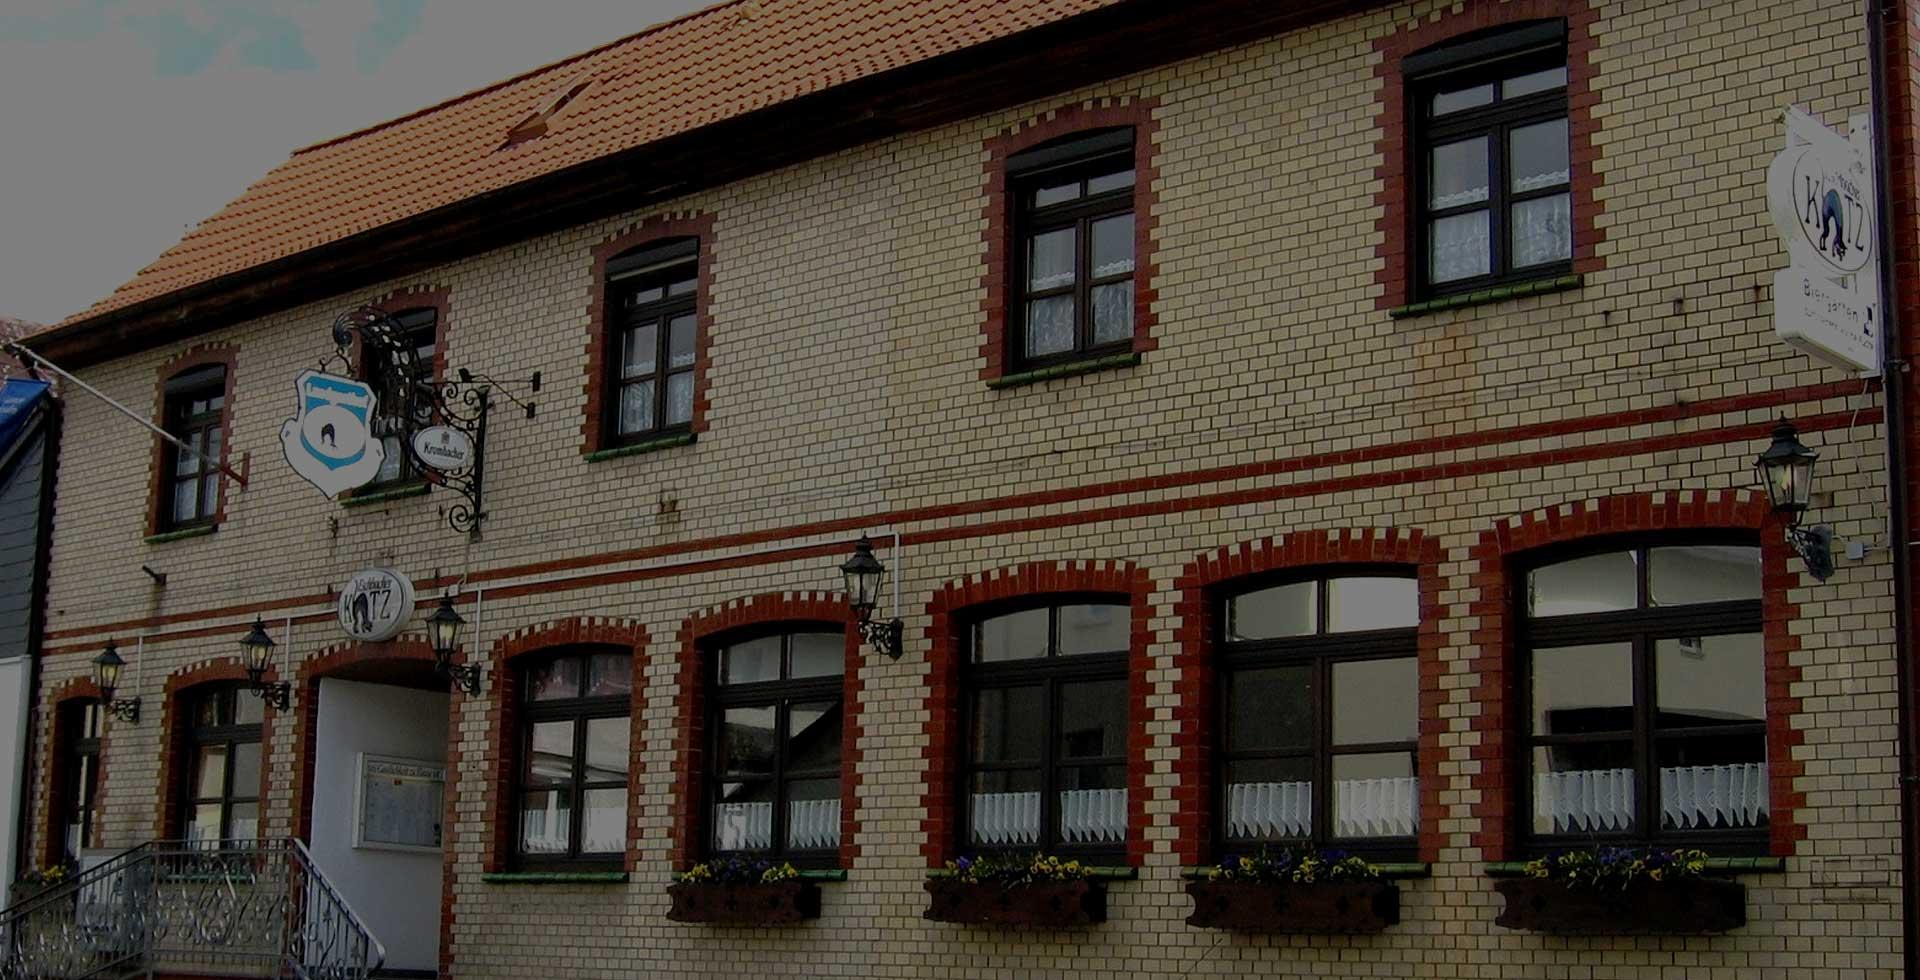 Landgasthof-Eschbacher-katz-2021-slide1